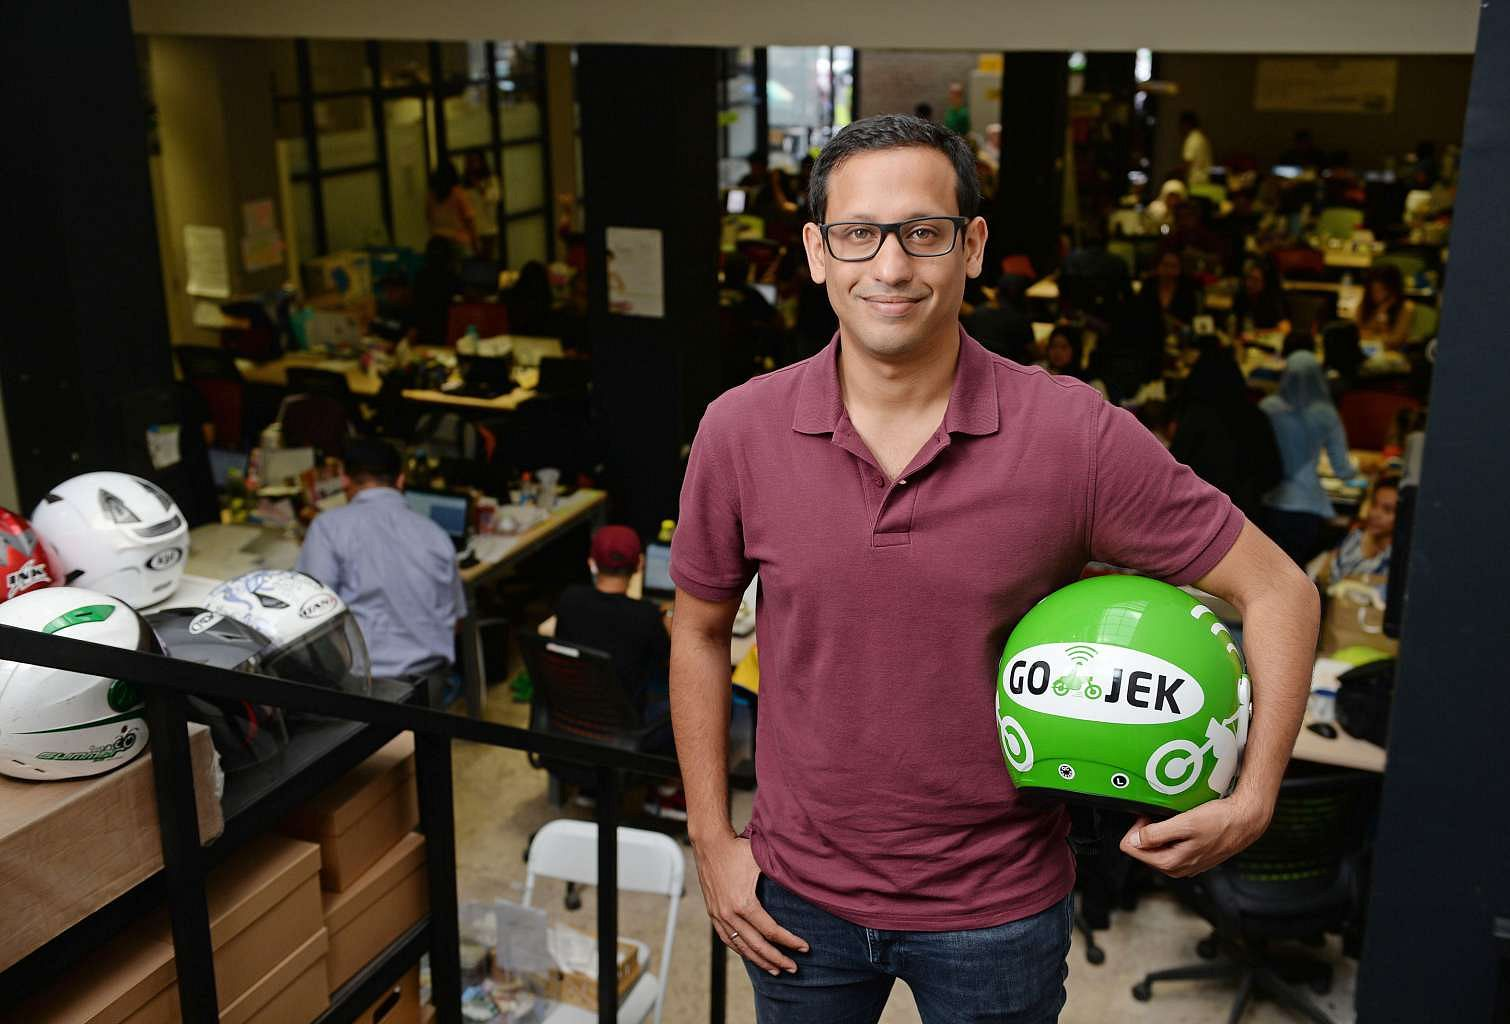 Go-Jek Founder and CEO Nadiem Makarim | Straits Times